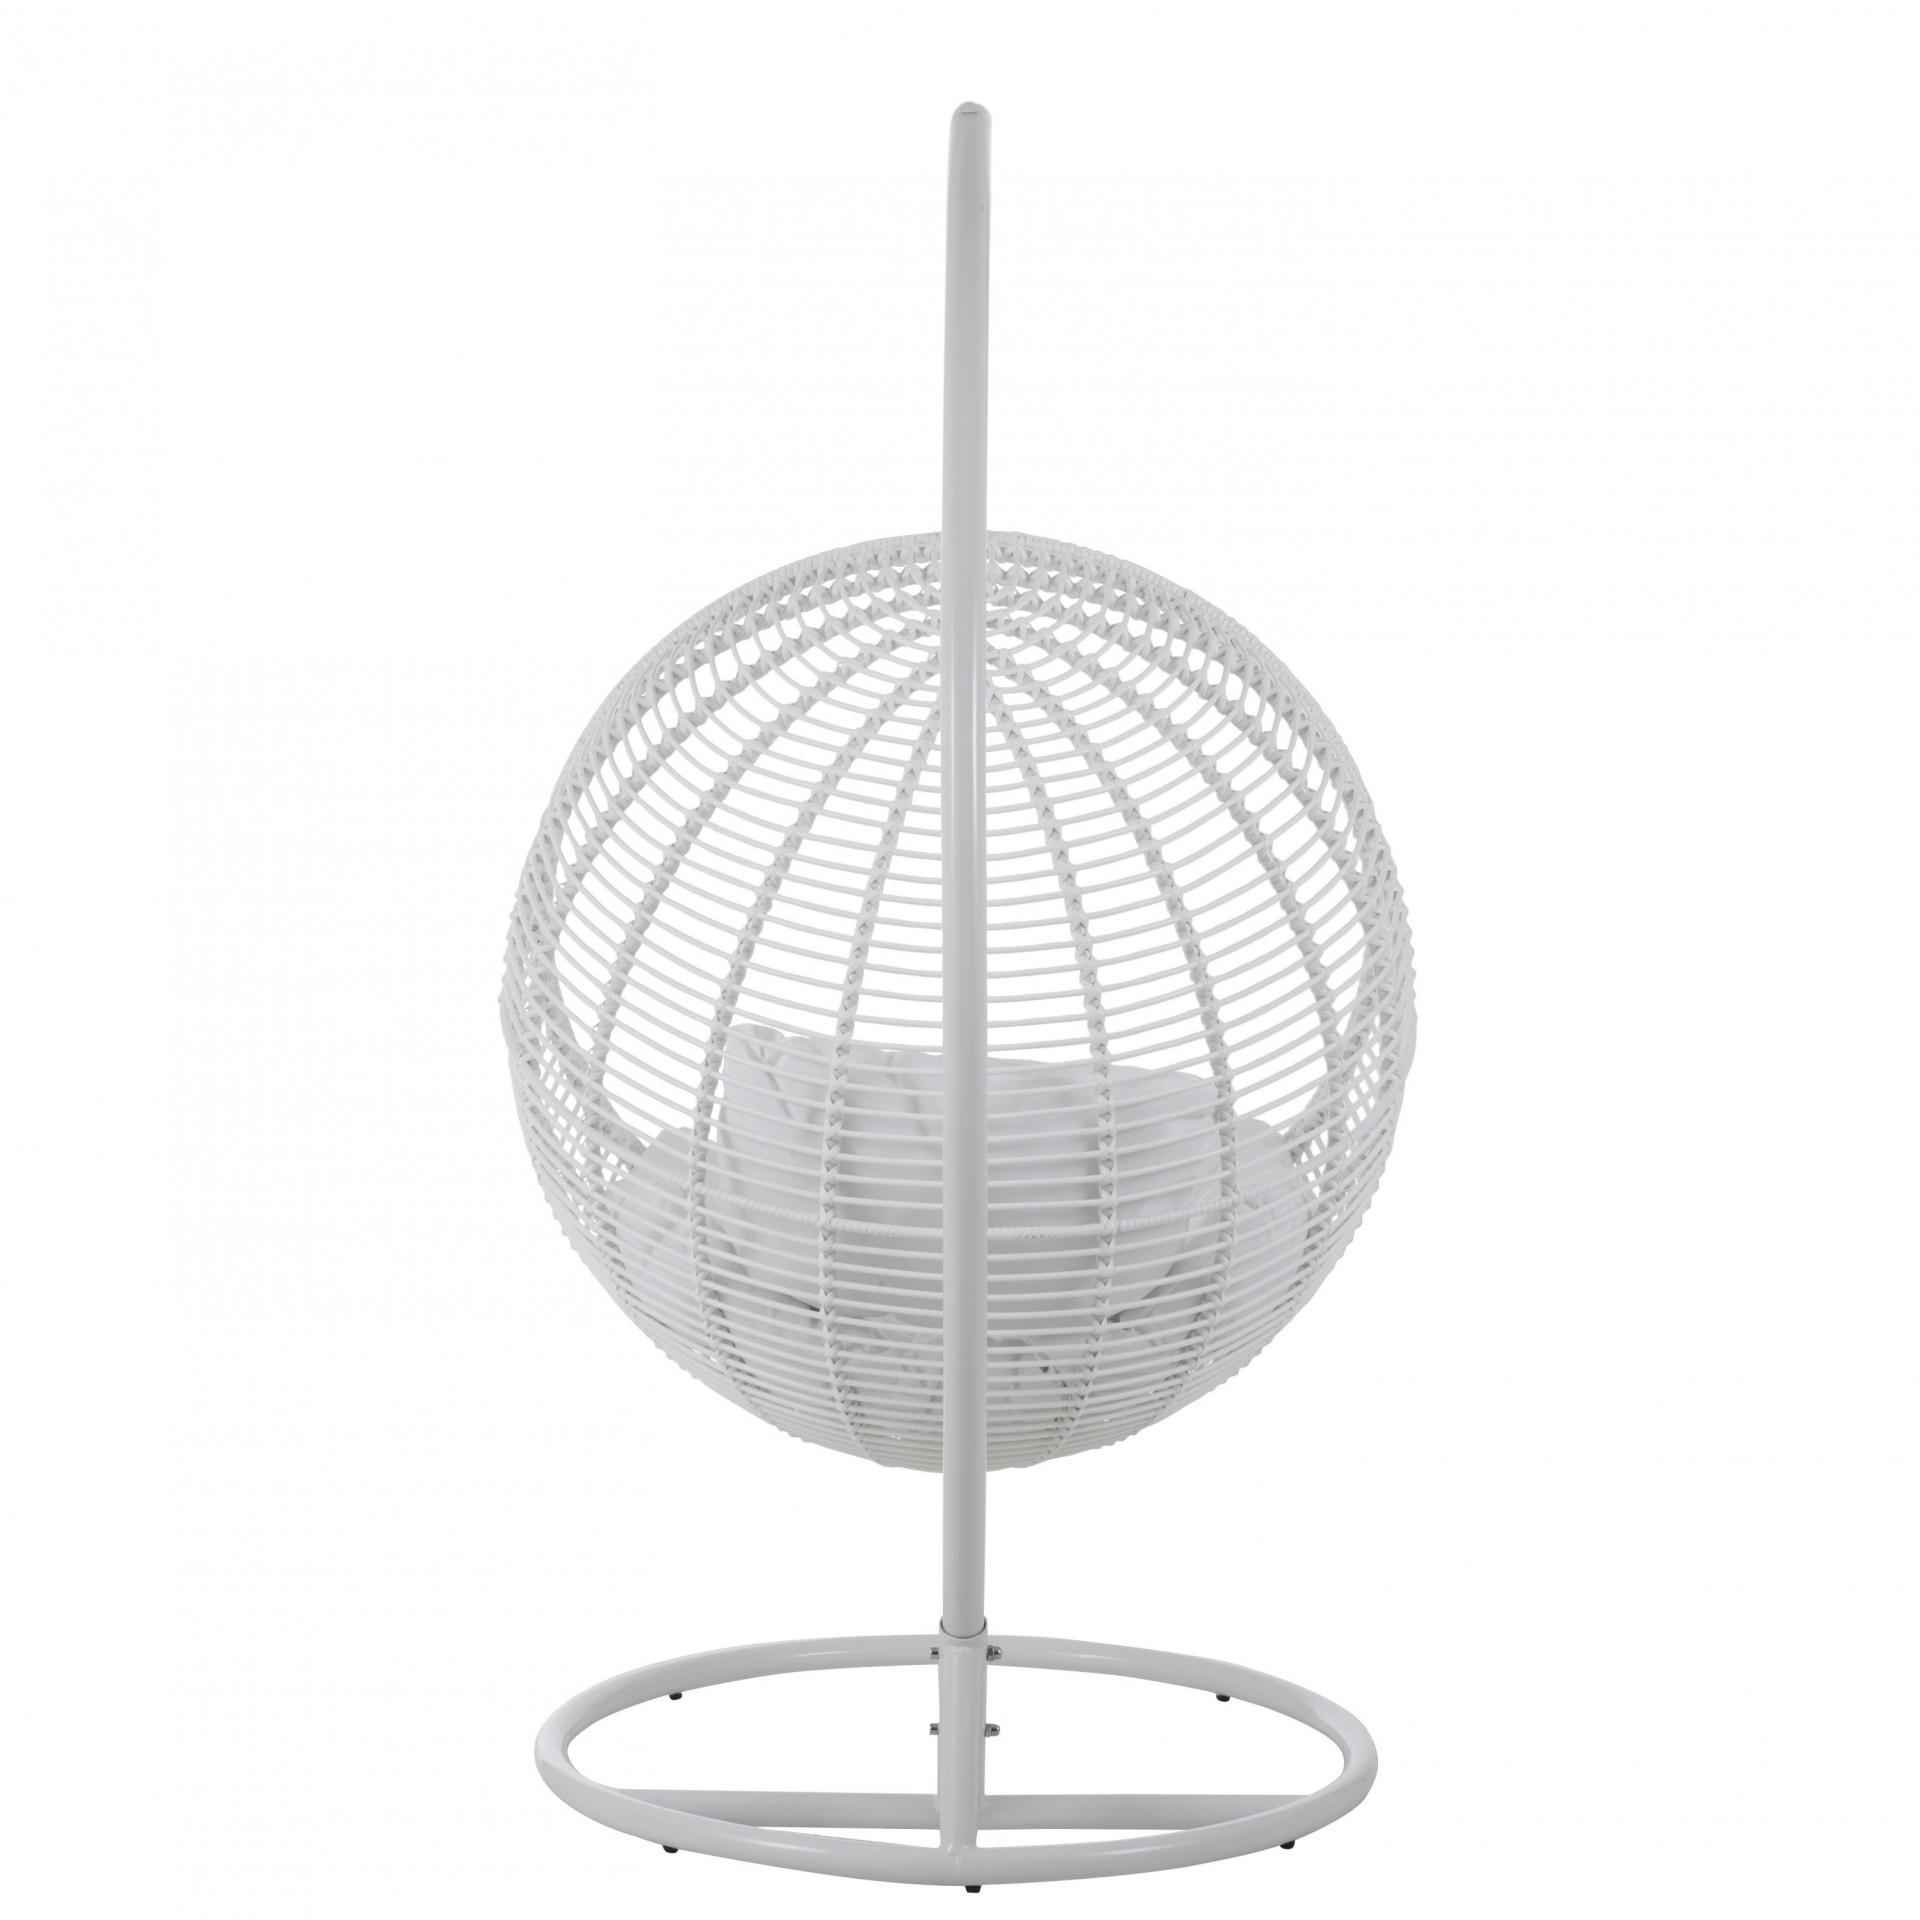 Cadeira suspensa c/base, metal/vime, branco, 119x110x193